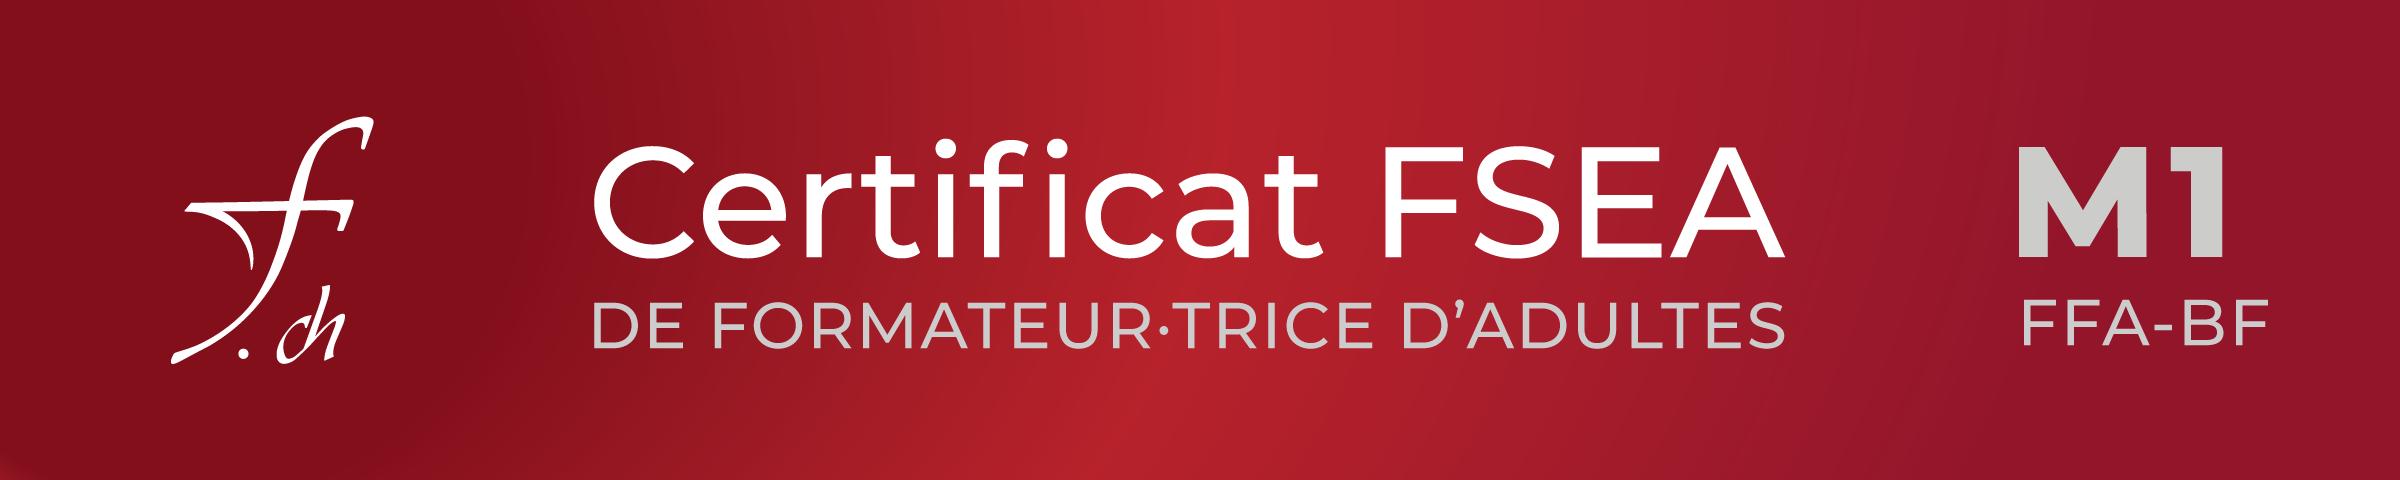 formationSch brevetFFA M1 Certificat FSEA